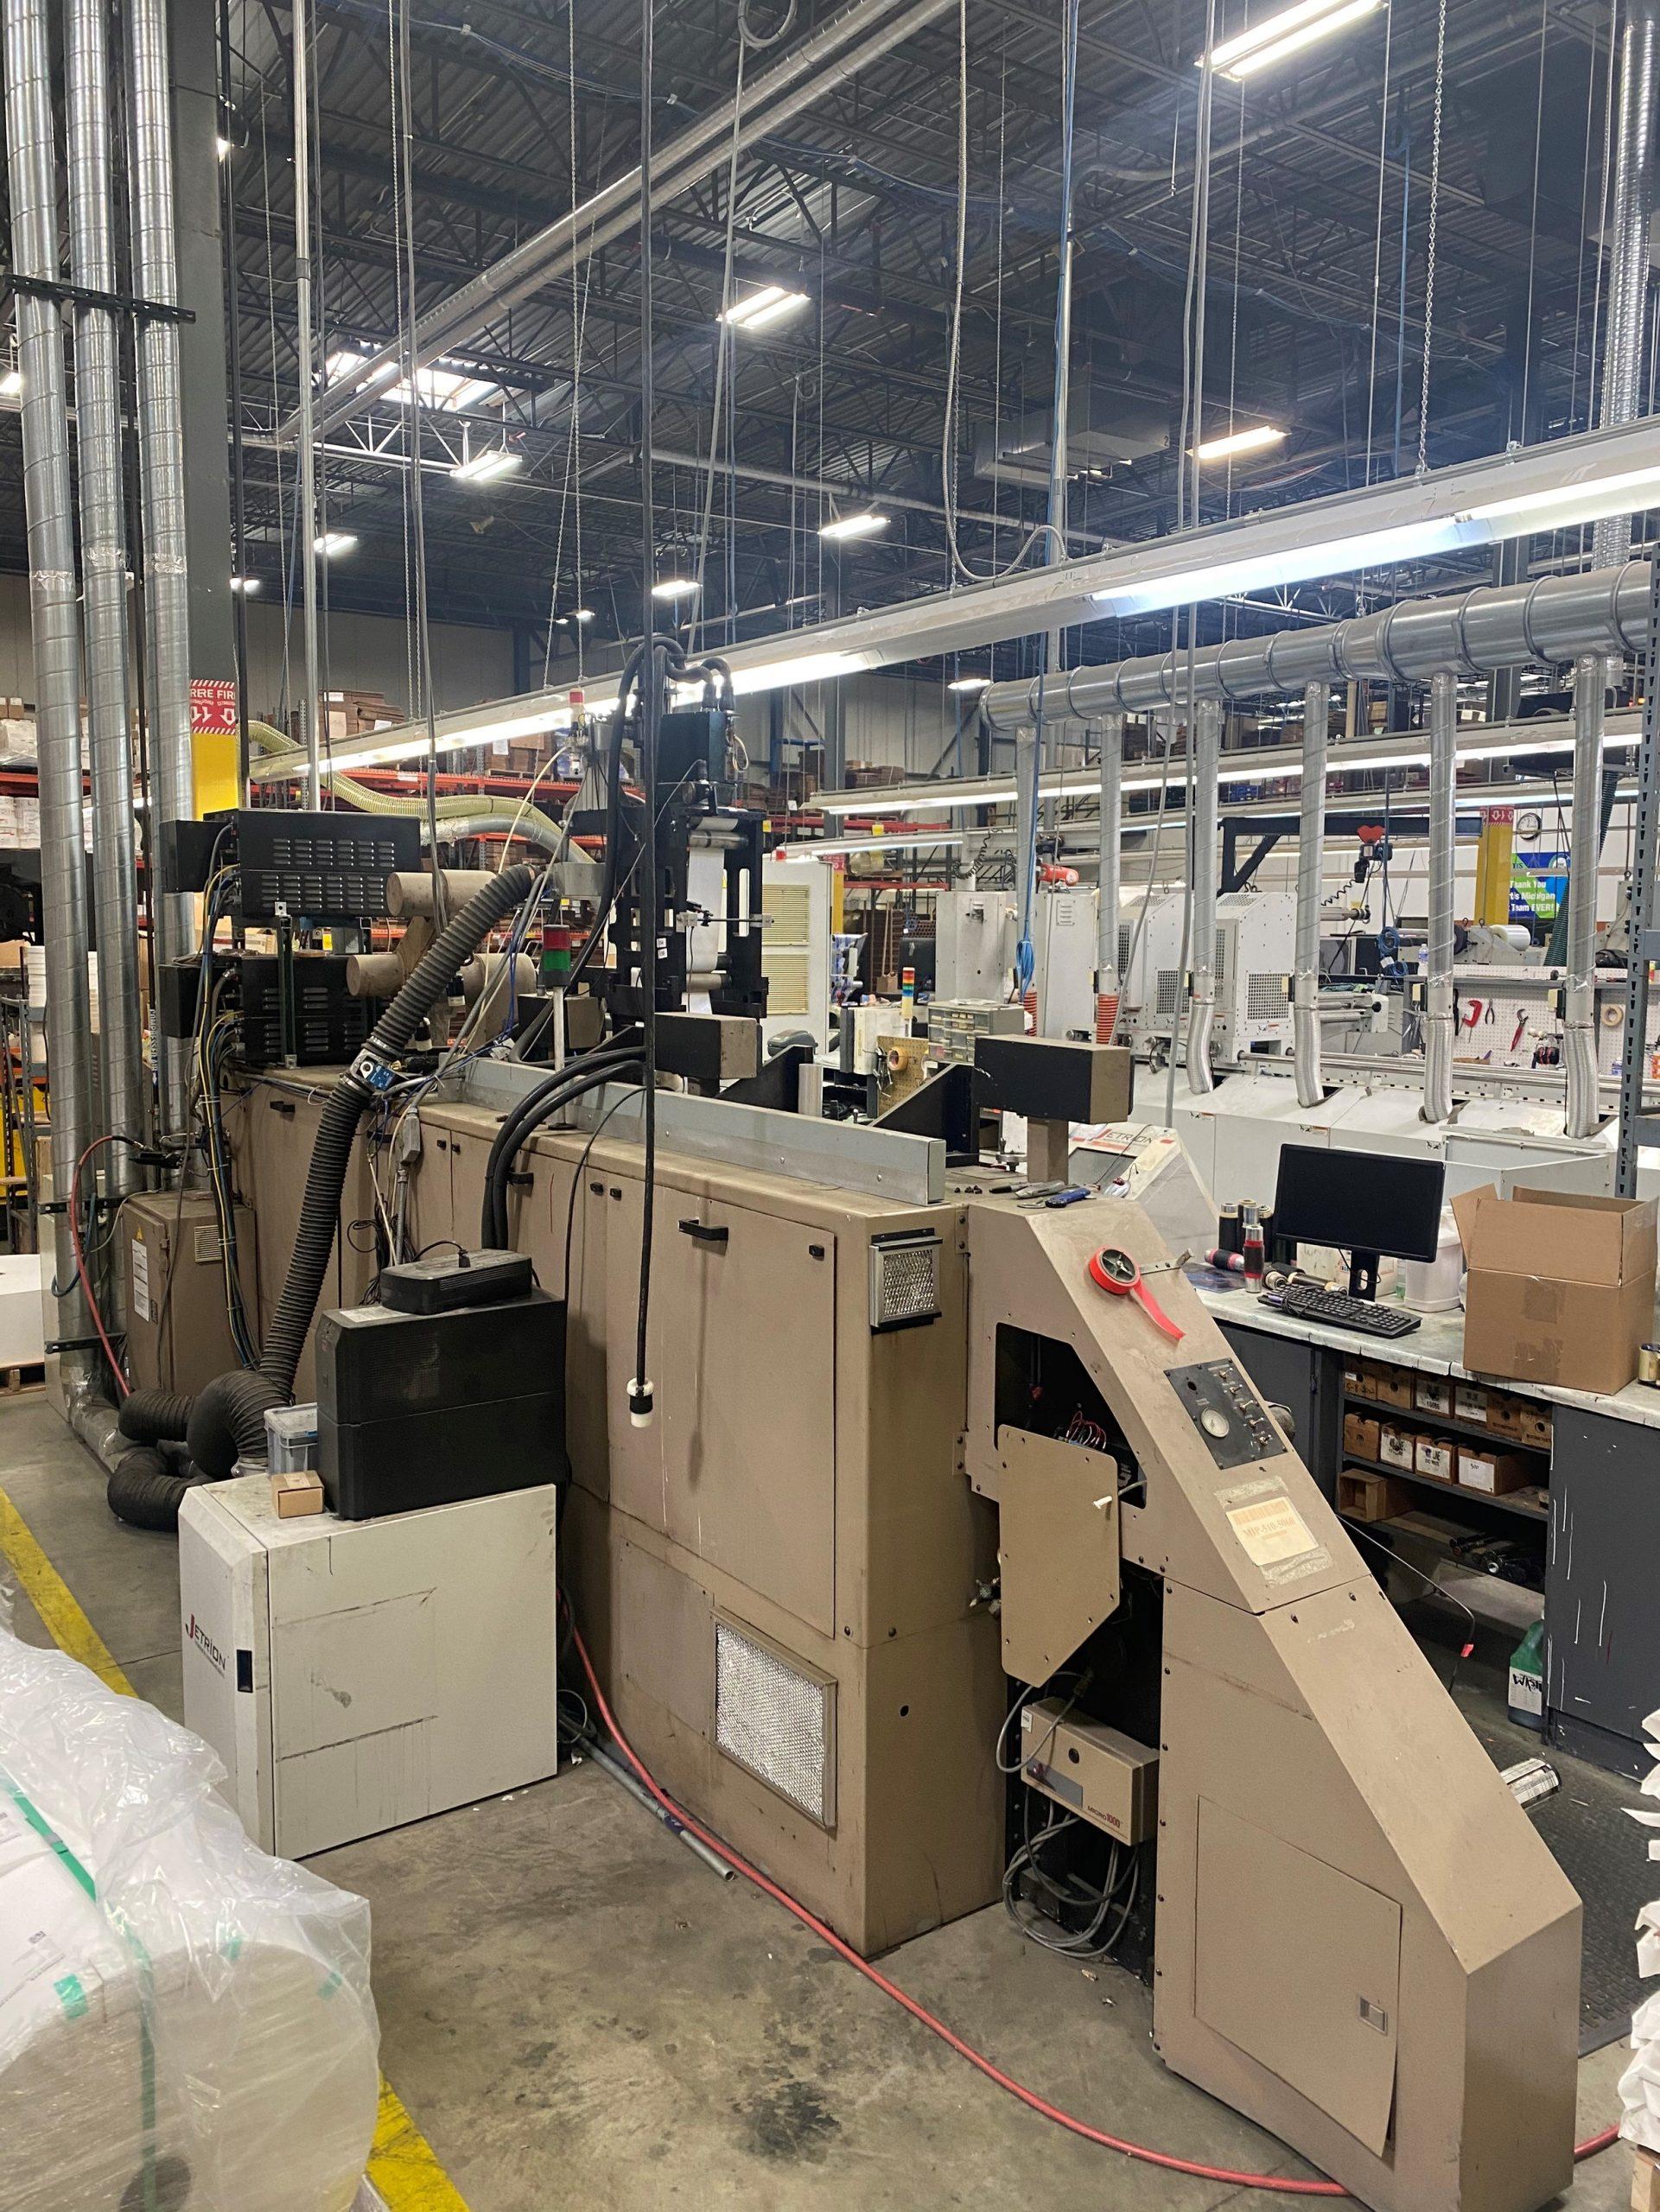 Webtron 750 HQV - Used Flexo Printing Presses and Used Flexographic Equipment-4